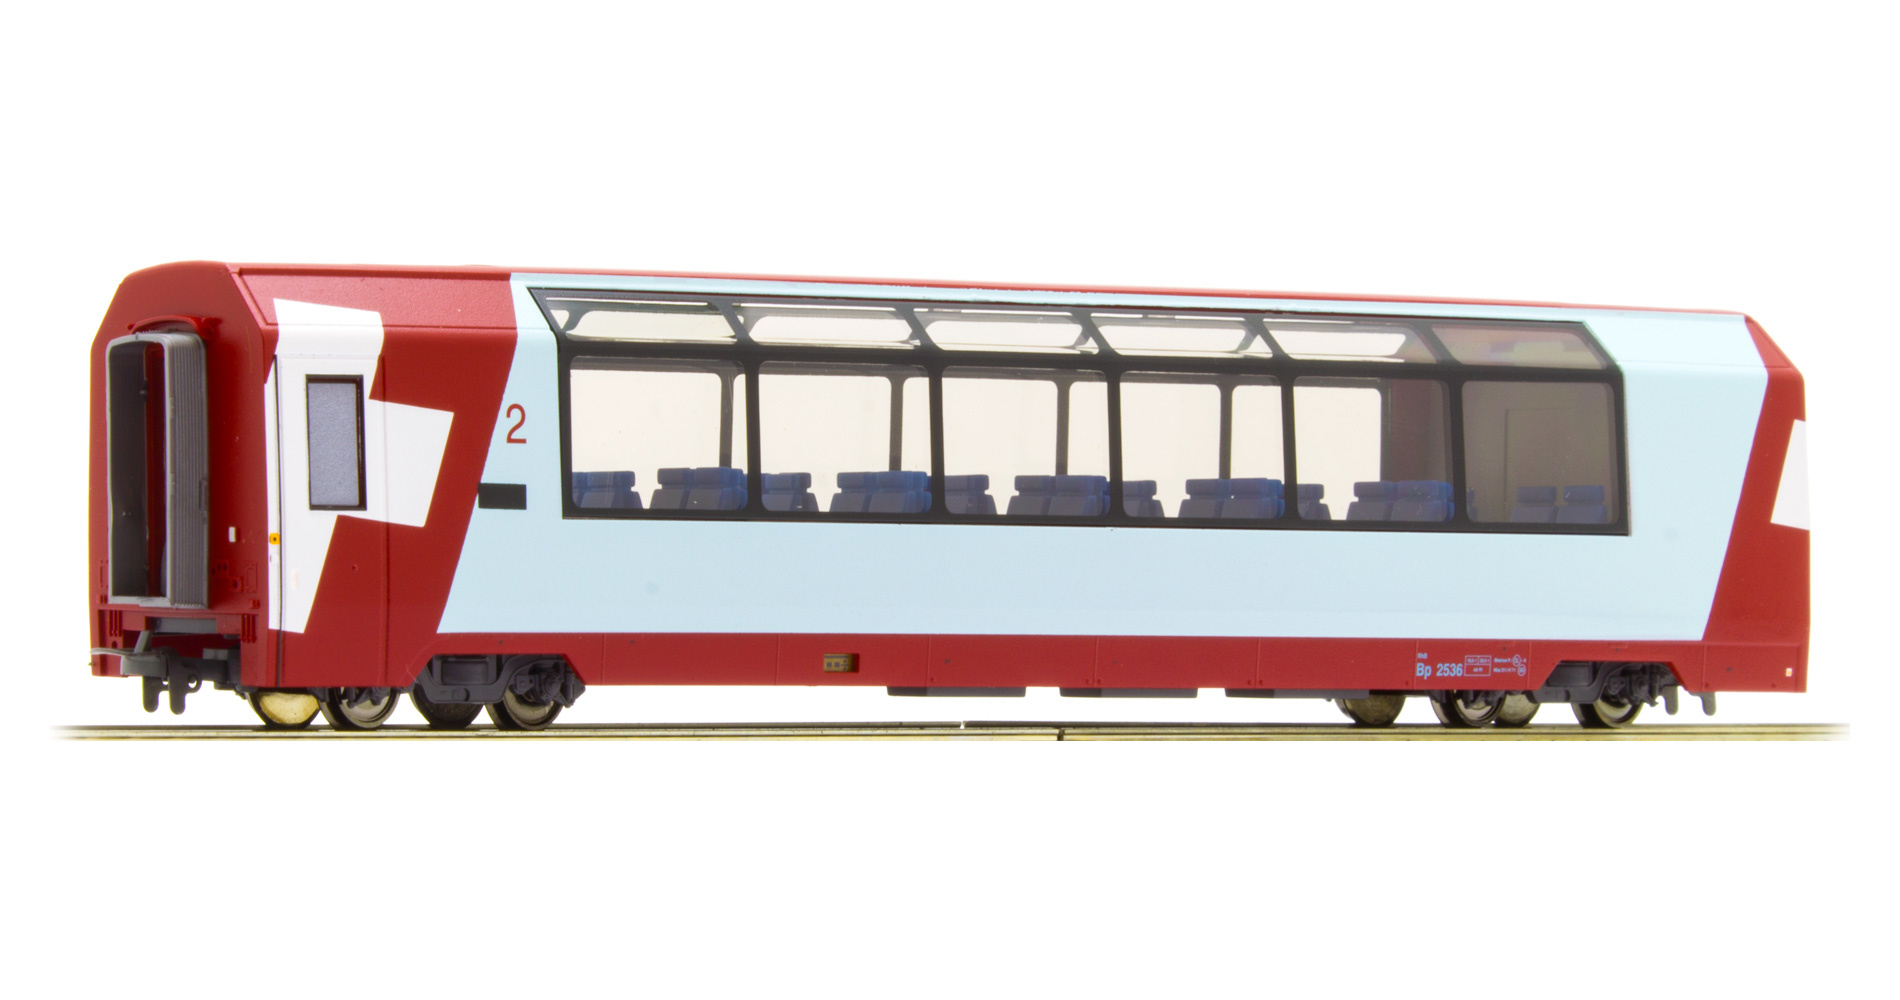 3289126 RhB Bp 2536 Panoramawagen GEX-1